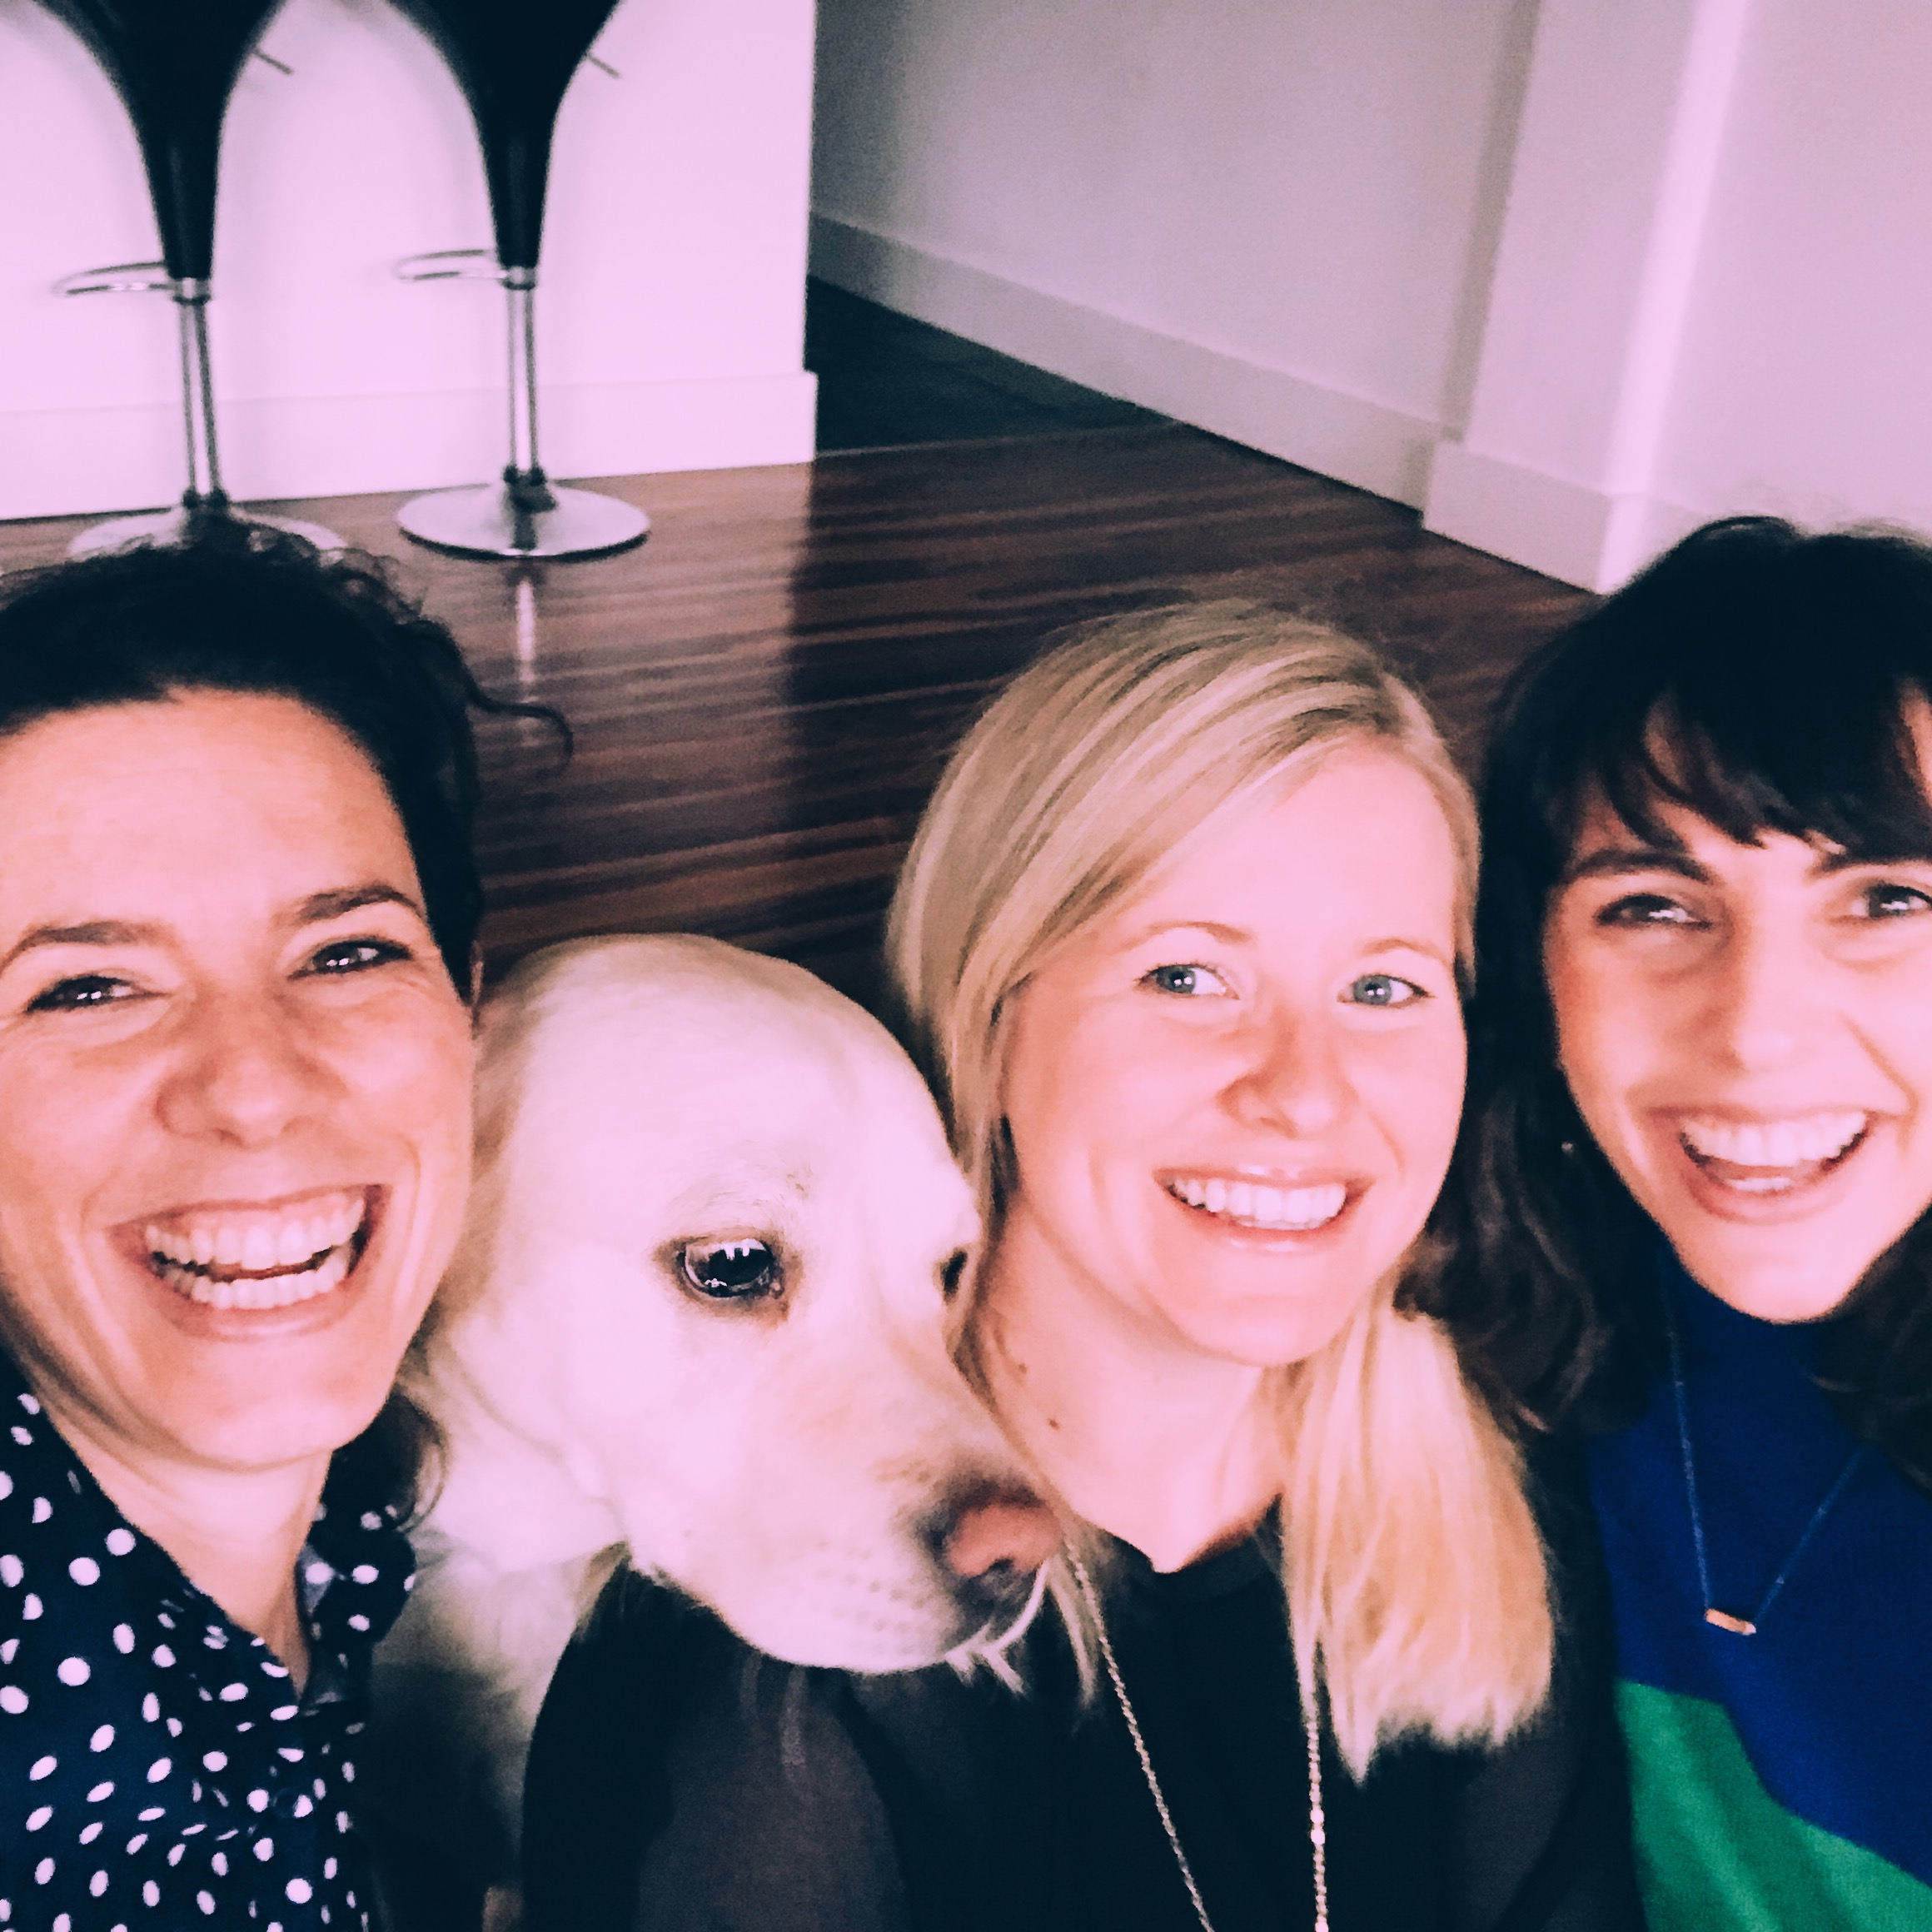 Selina-Vicki-Susanna-Happyologist-and-the-dog.JPG